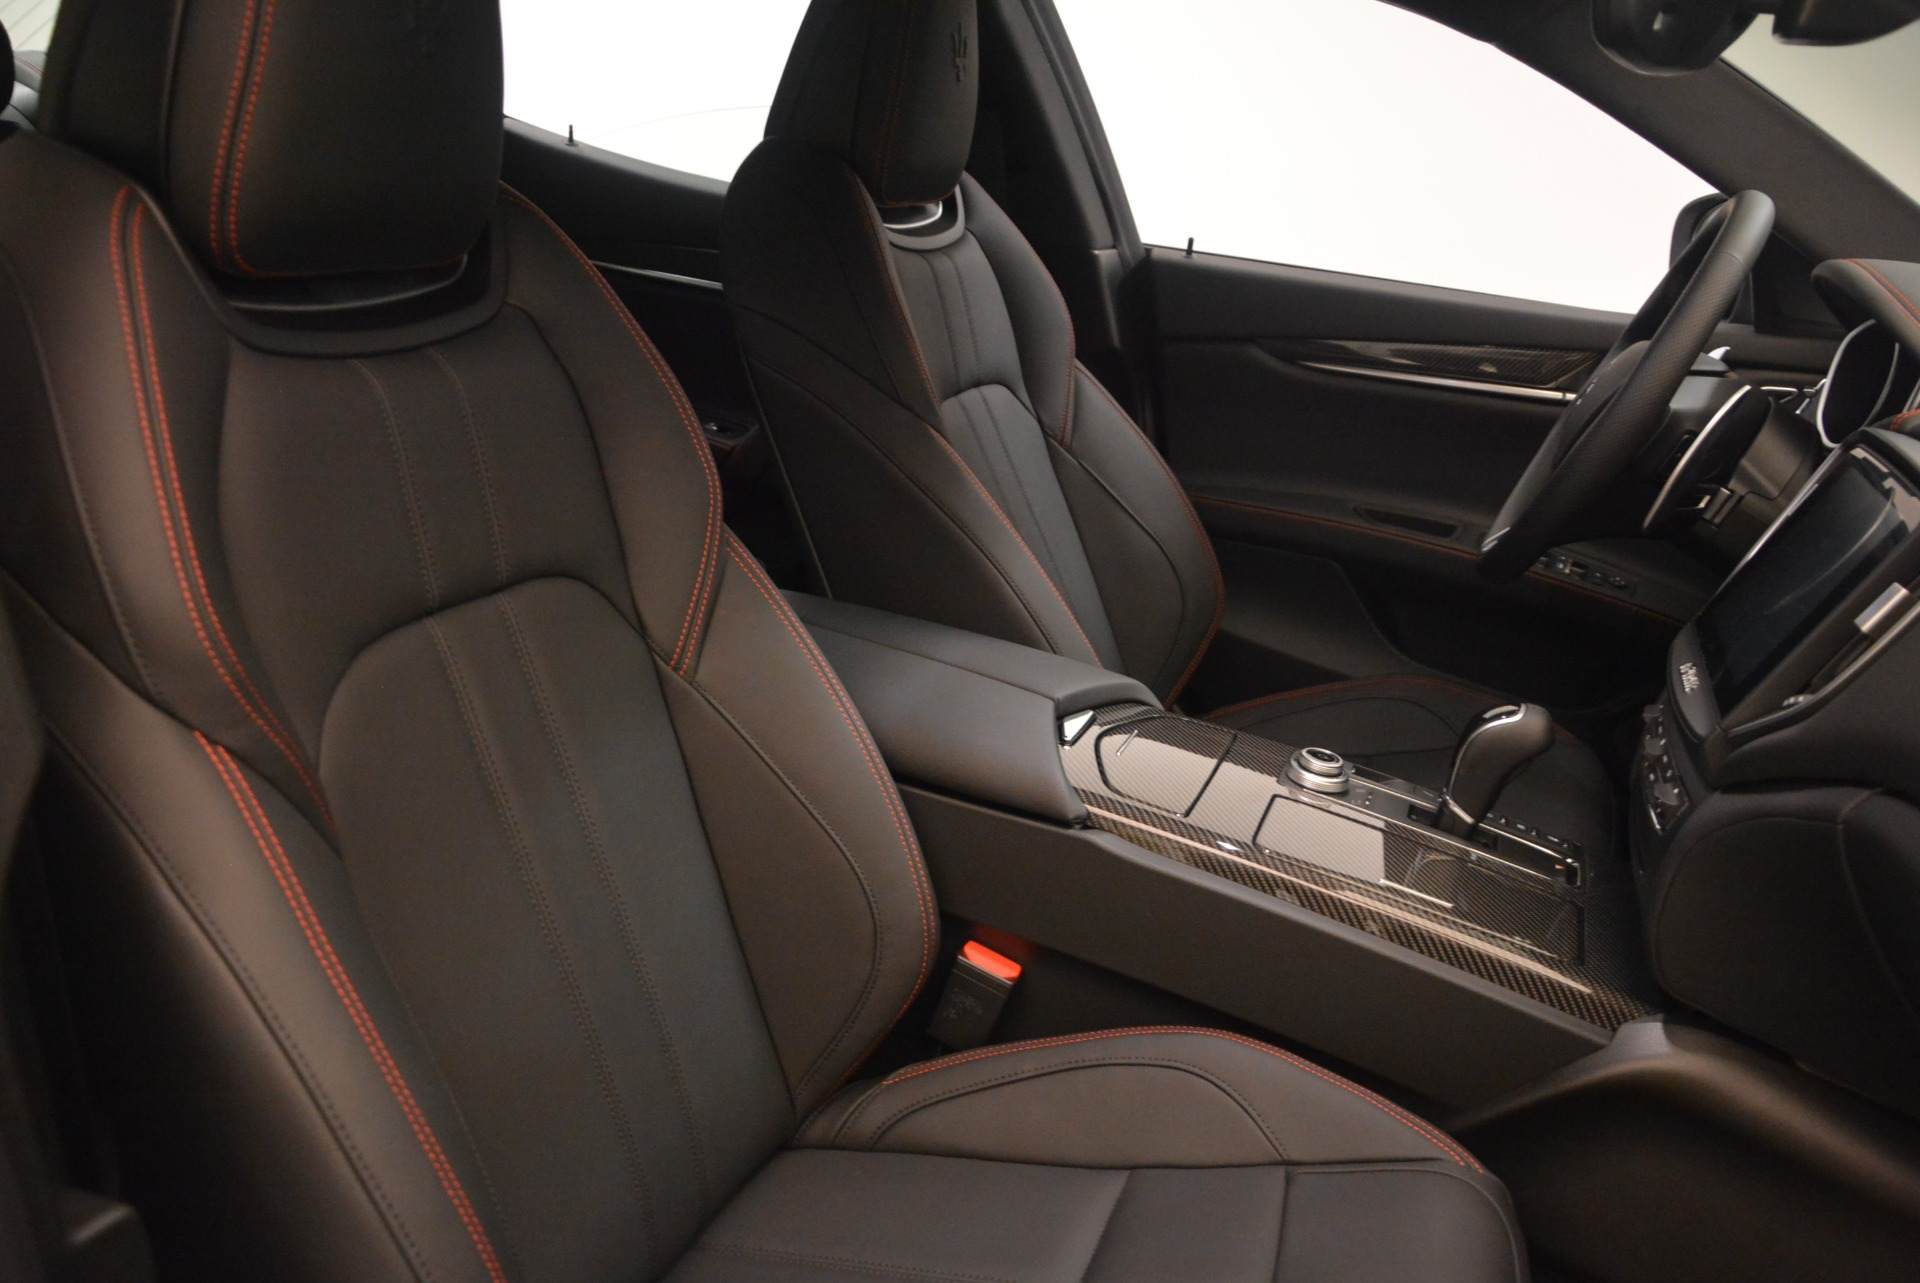 New 2018 Maserati Ghibli SQ4 GranSport Nerissimo For Sale In Westport, CT 2368_p18